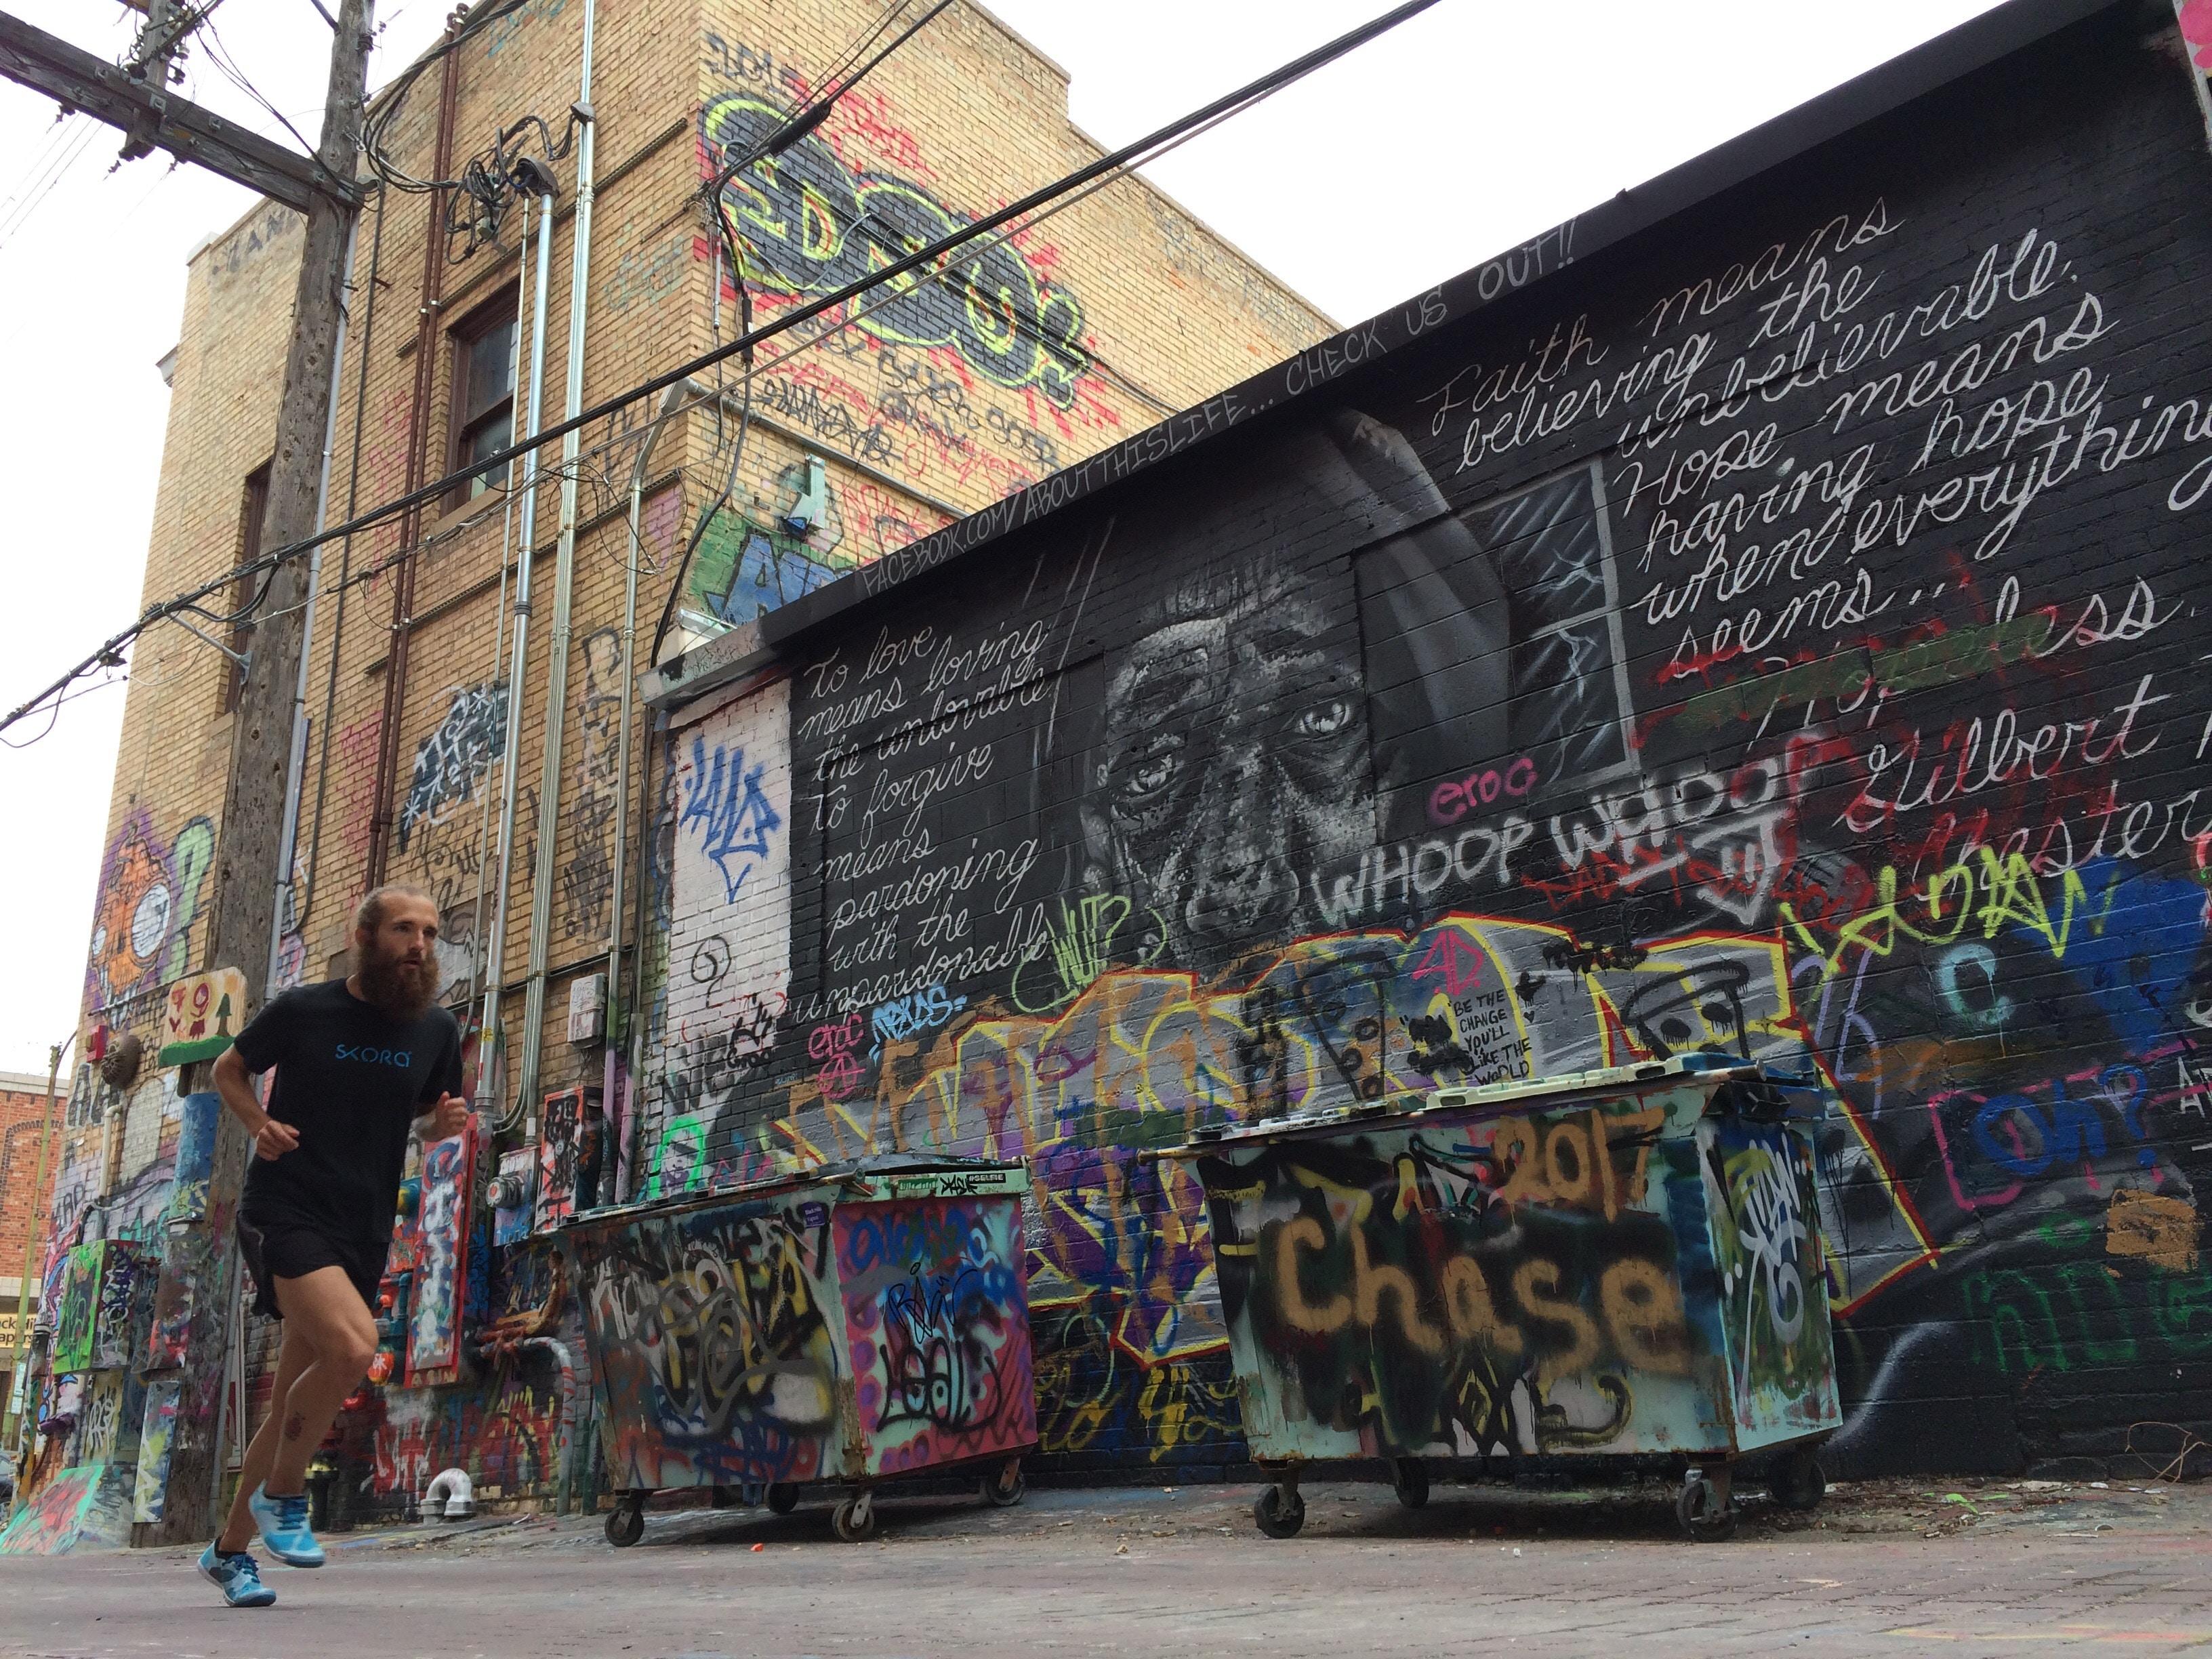 man in black shirt running near wall with graffiti